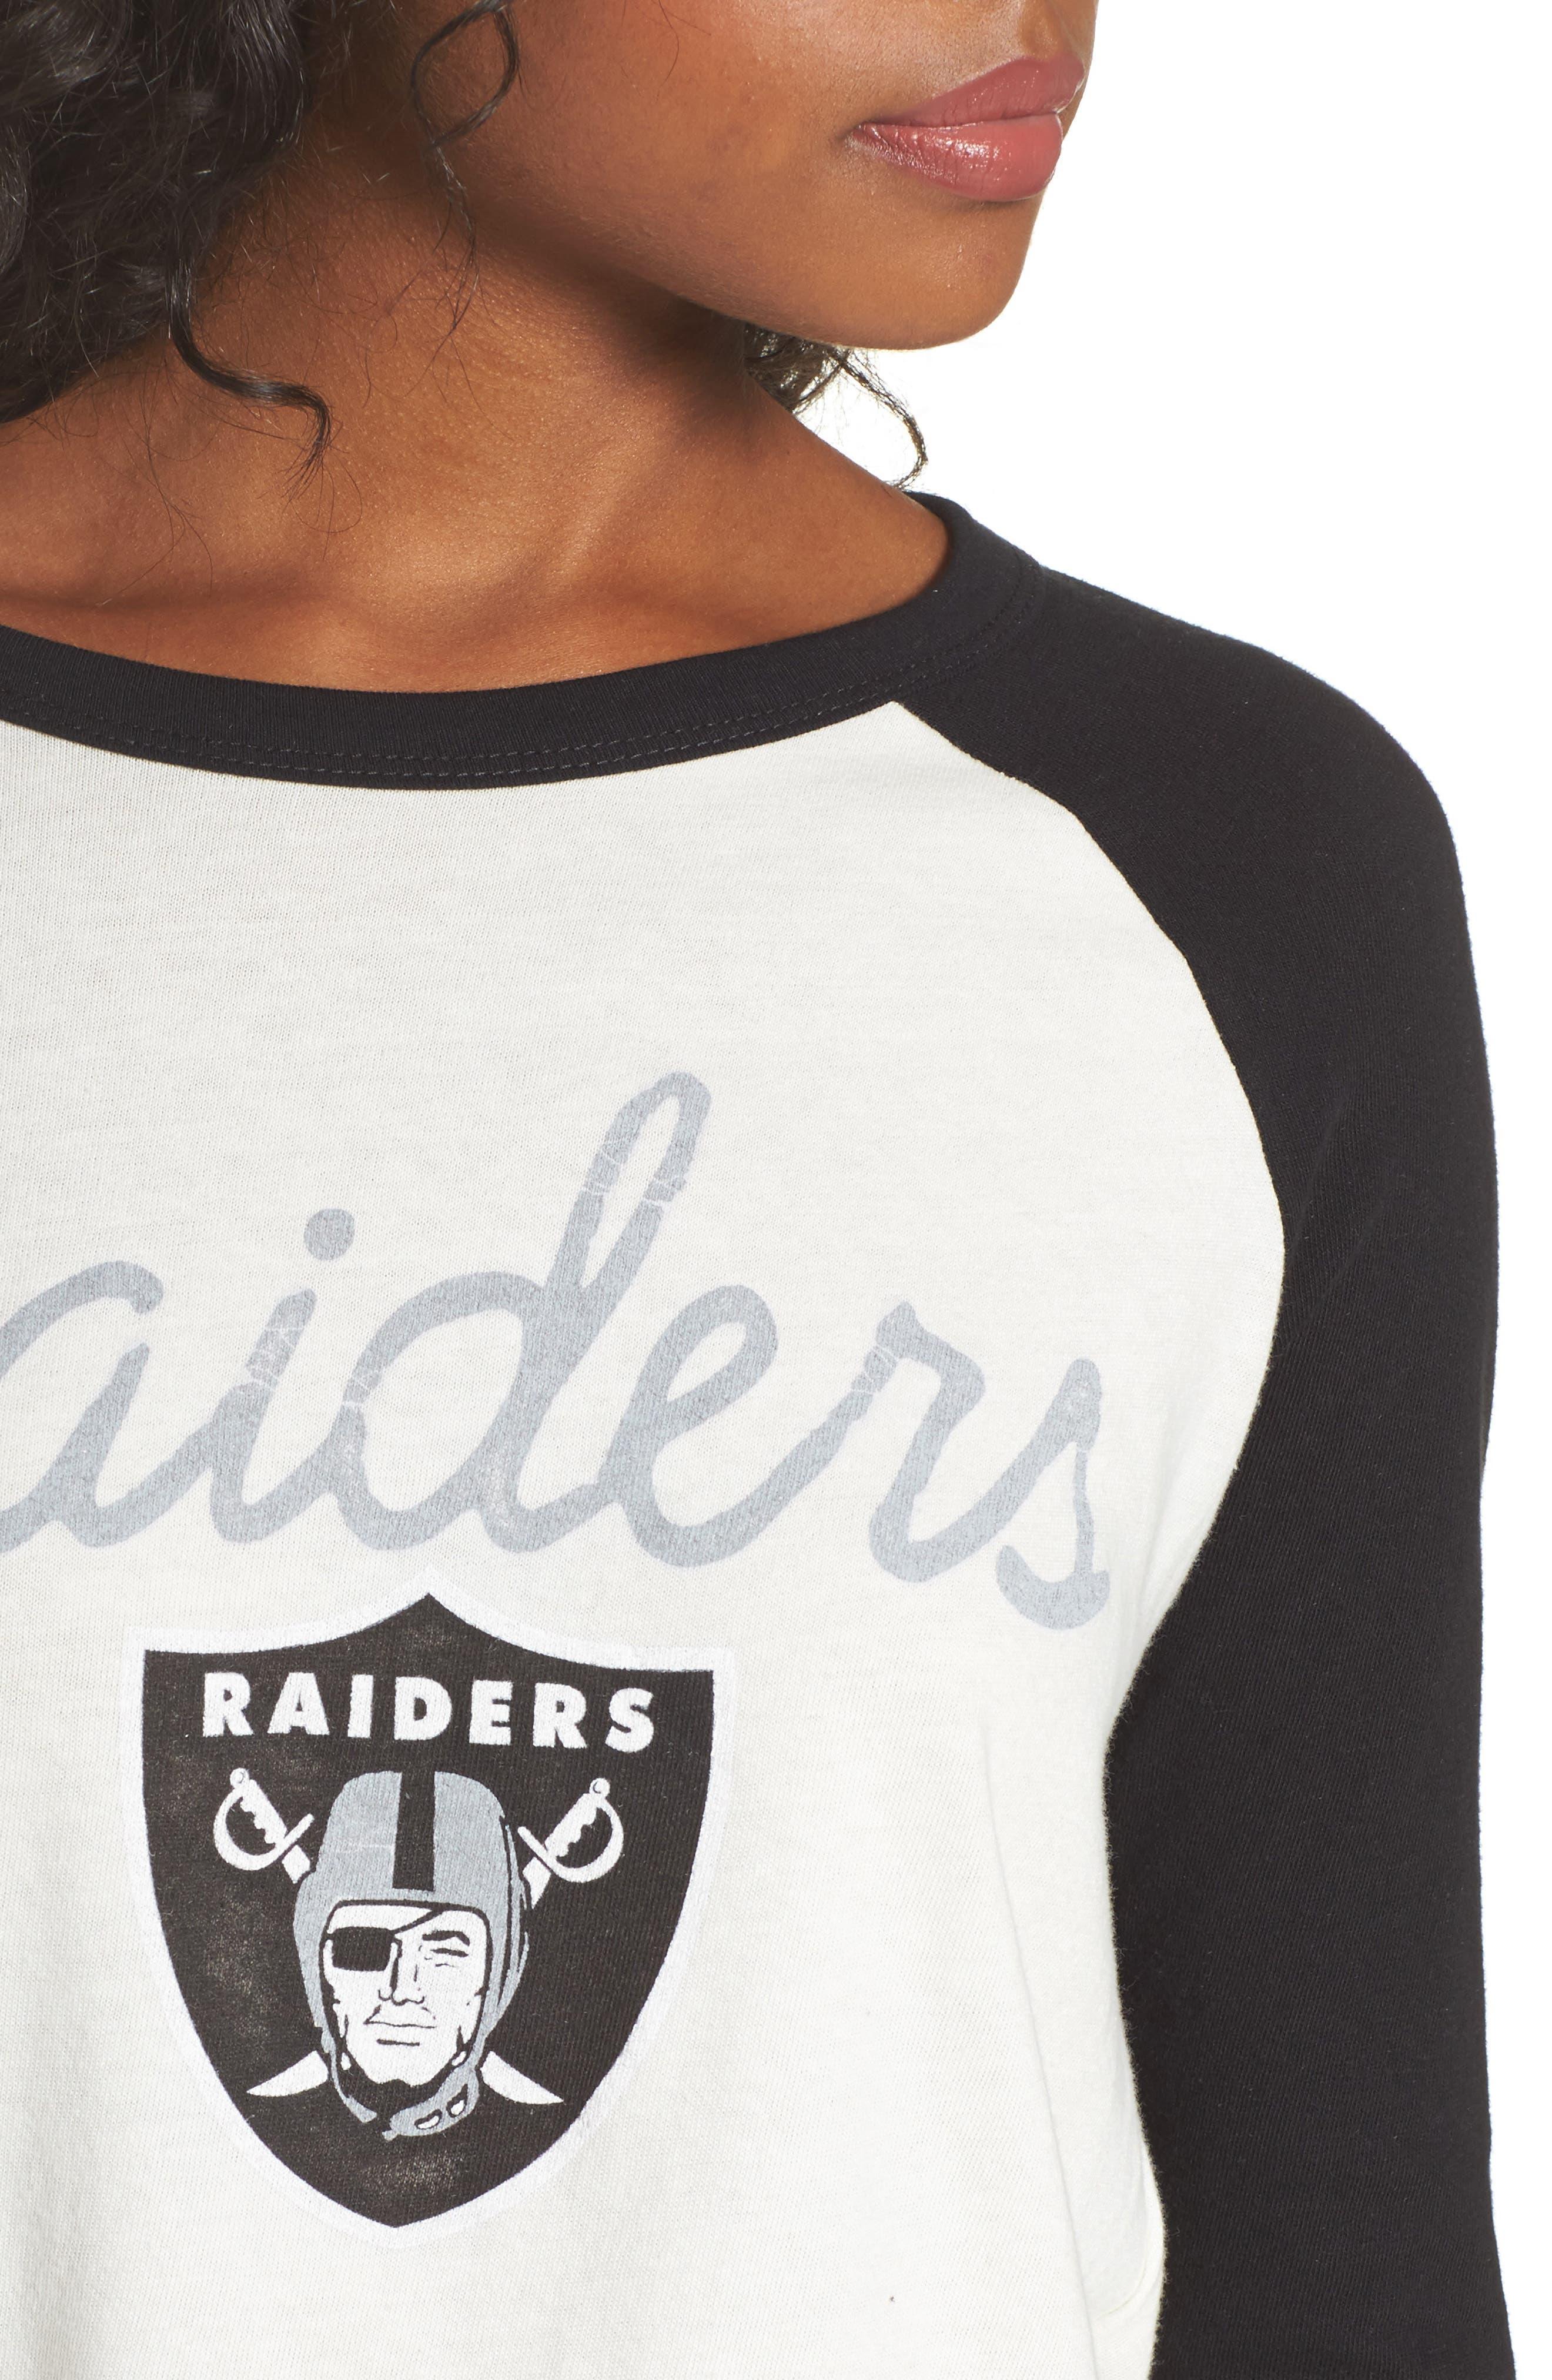 NFL Oakland Raiders Raglan Tee,                             Alternate thumbnail 4, color,                             189